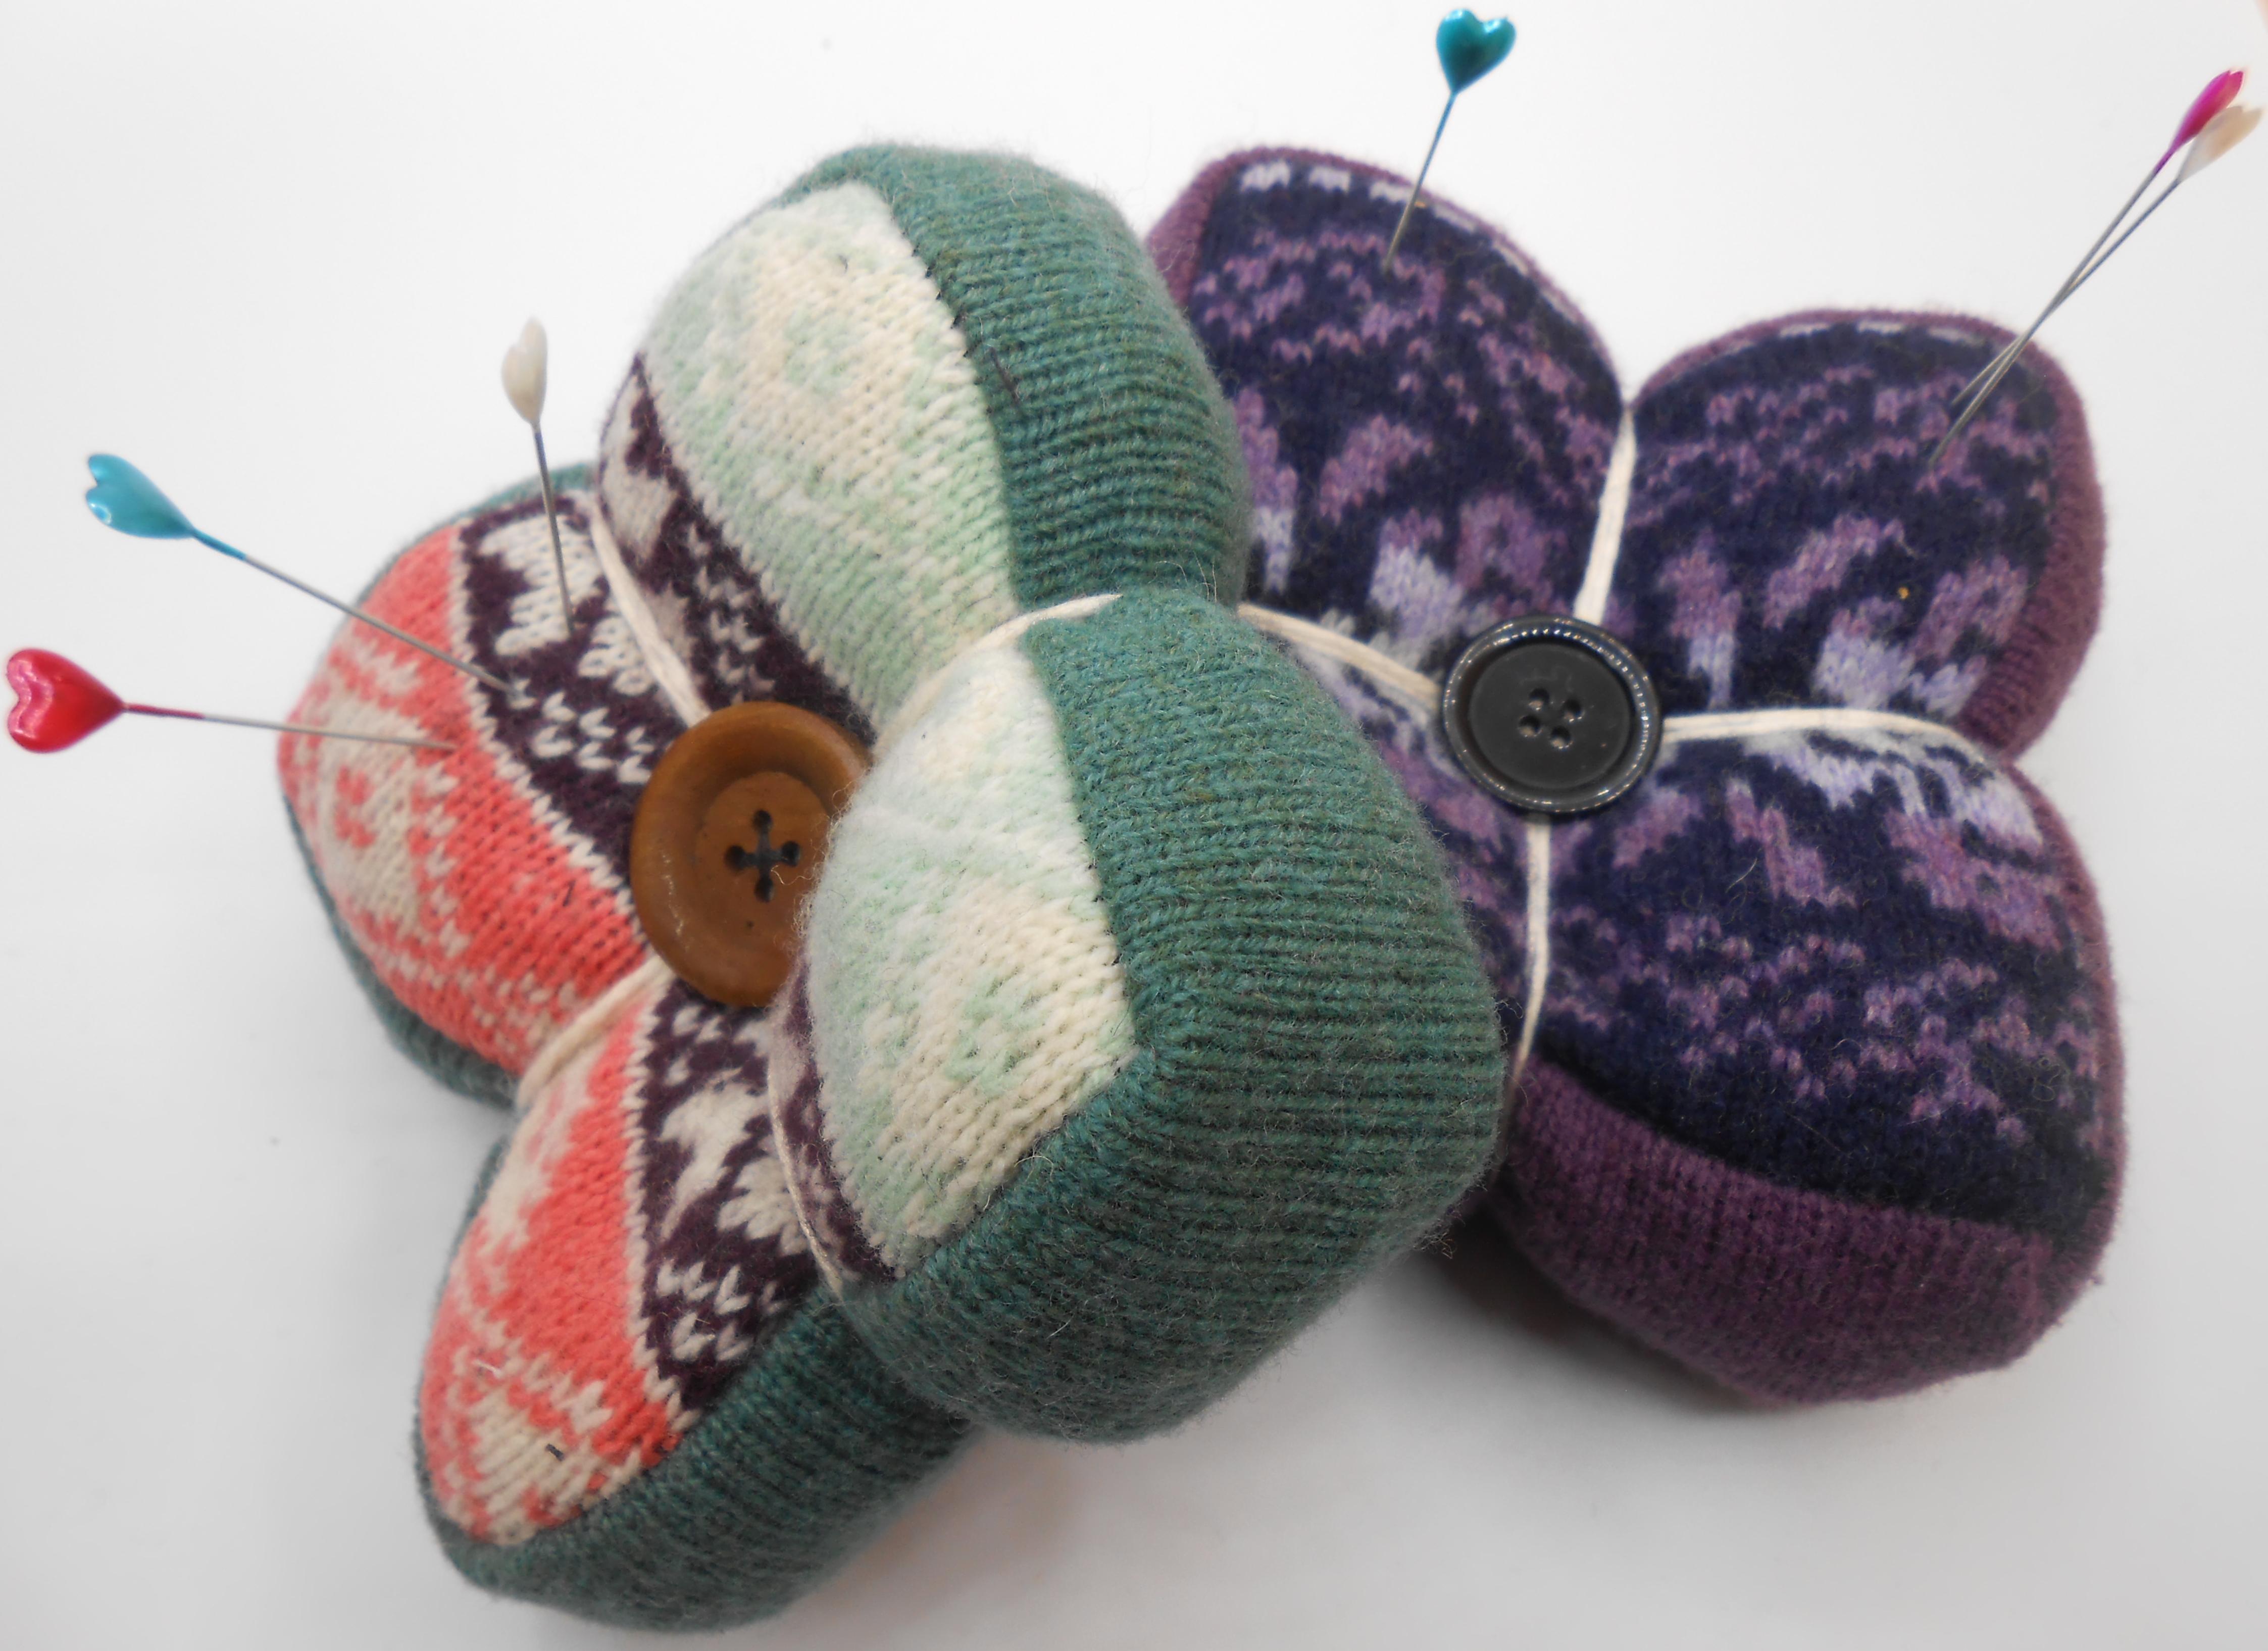 upcycled wool pincushions